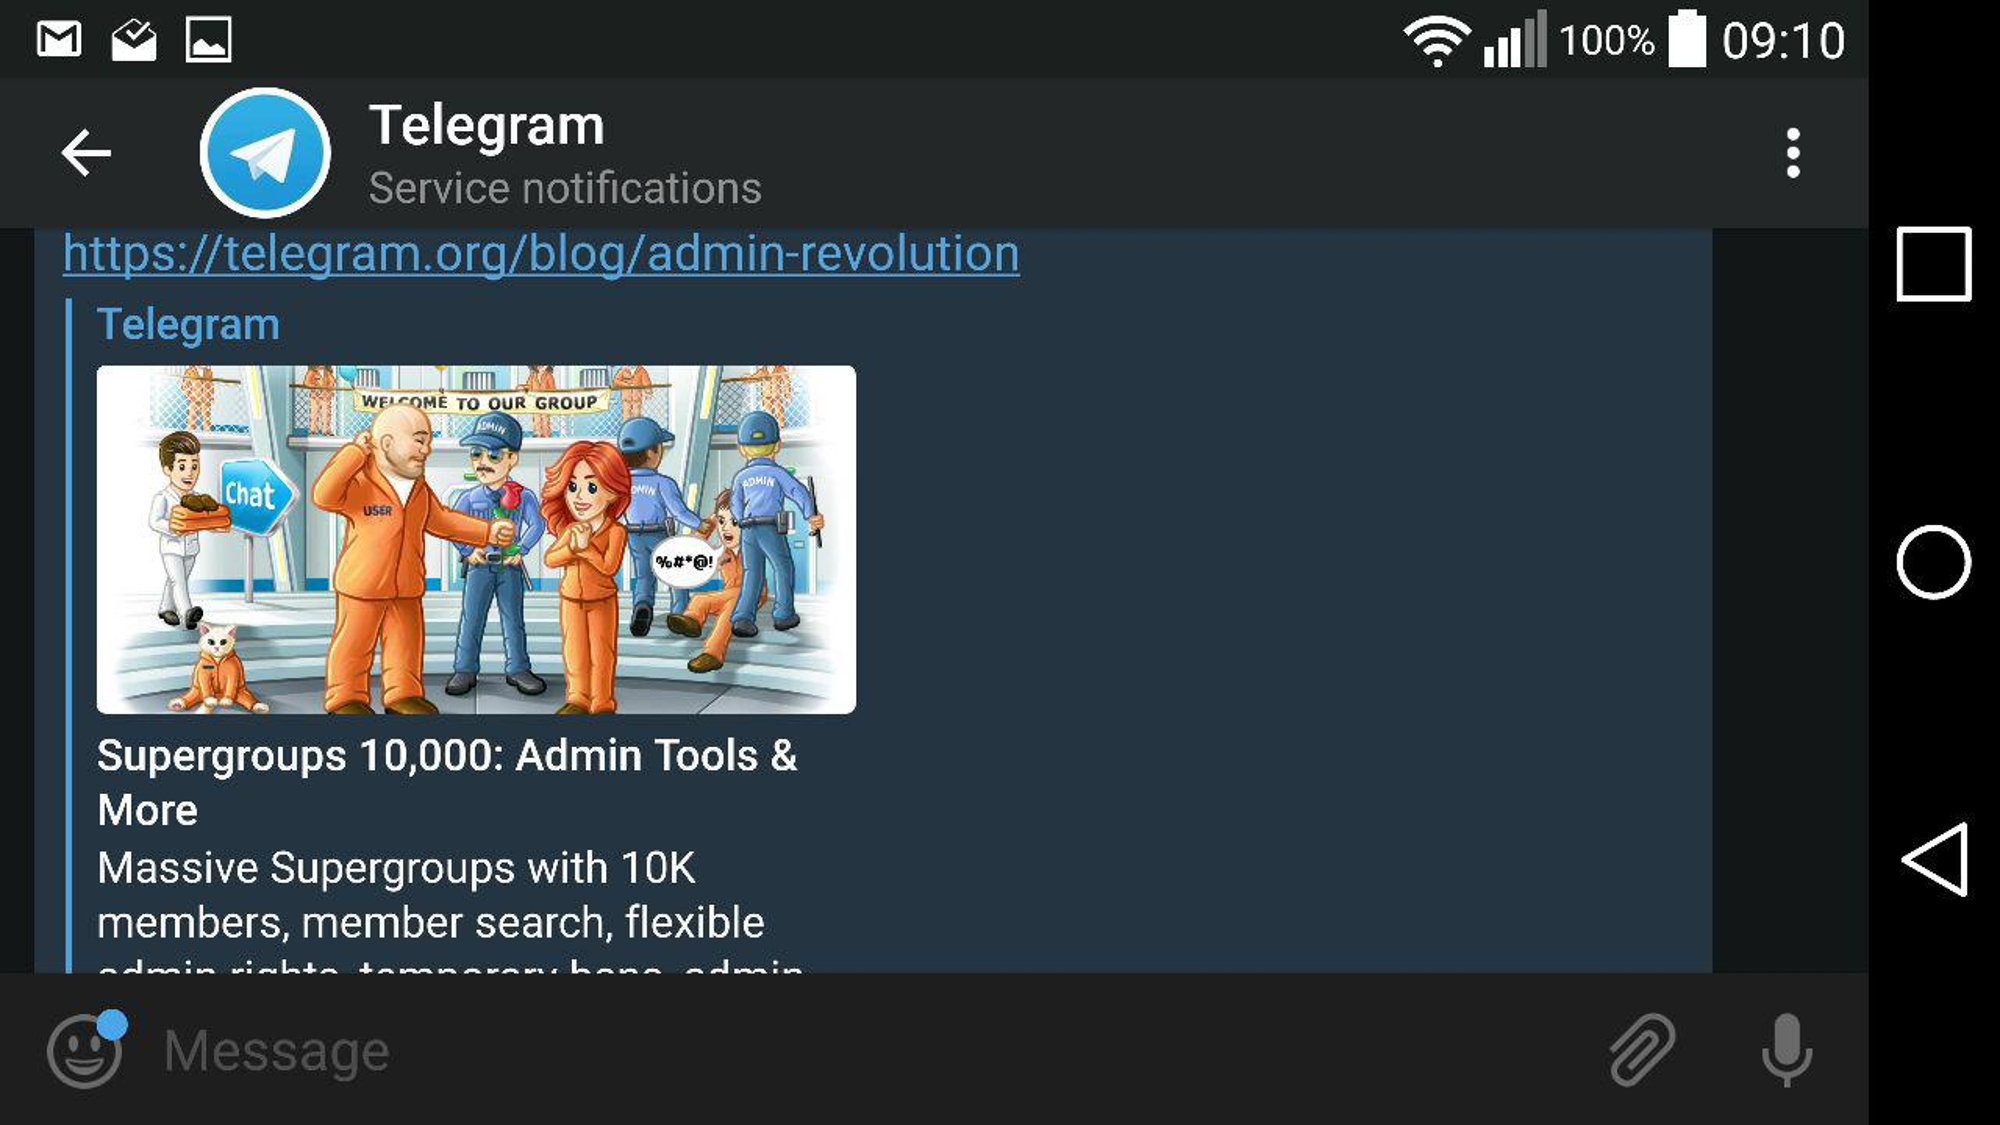 HOWTO: [Telegram, cloud, transfer files, mobile] How to use Telegram